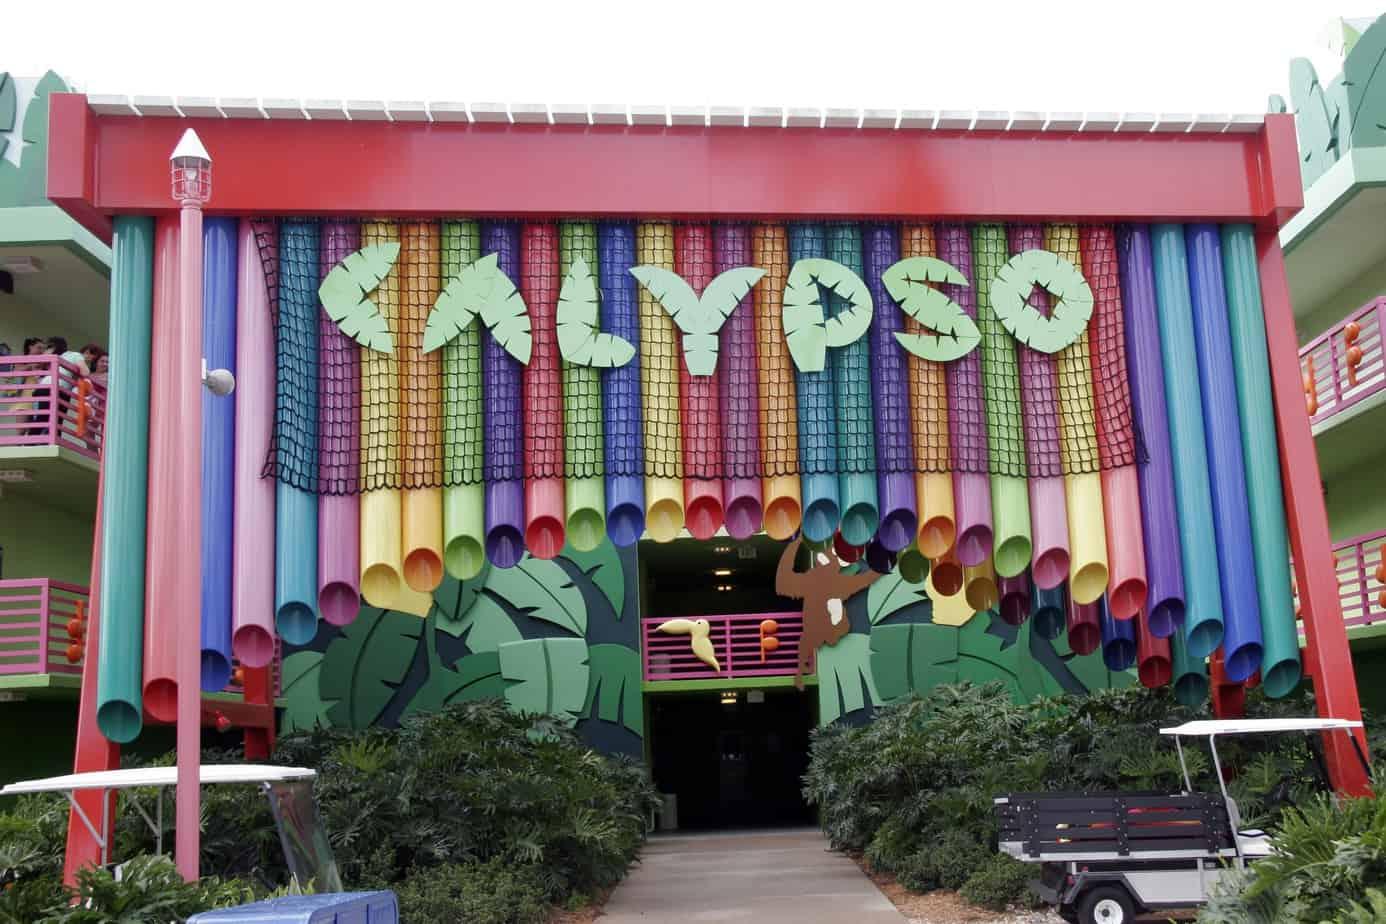 Calypso Wing at Disneys All Star Music Resort